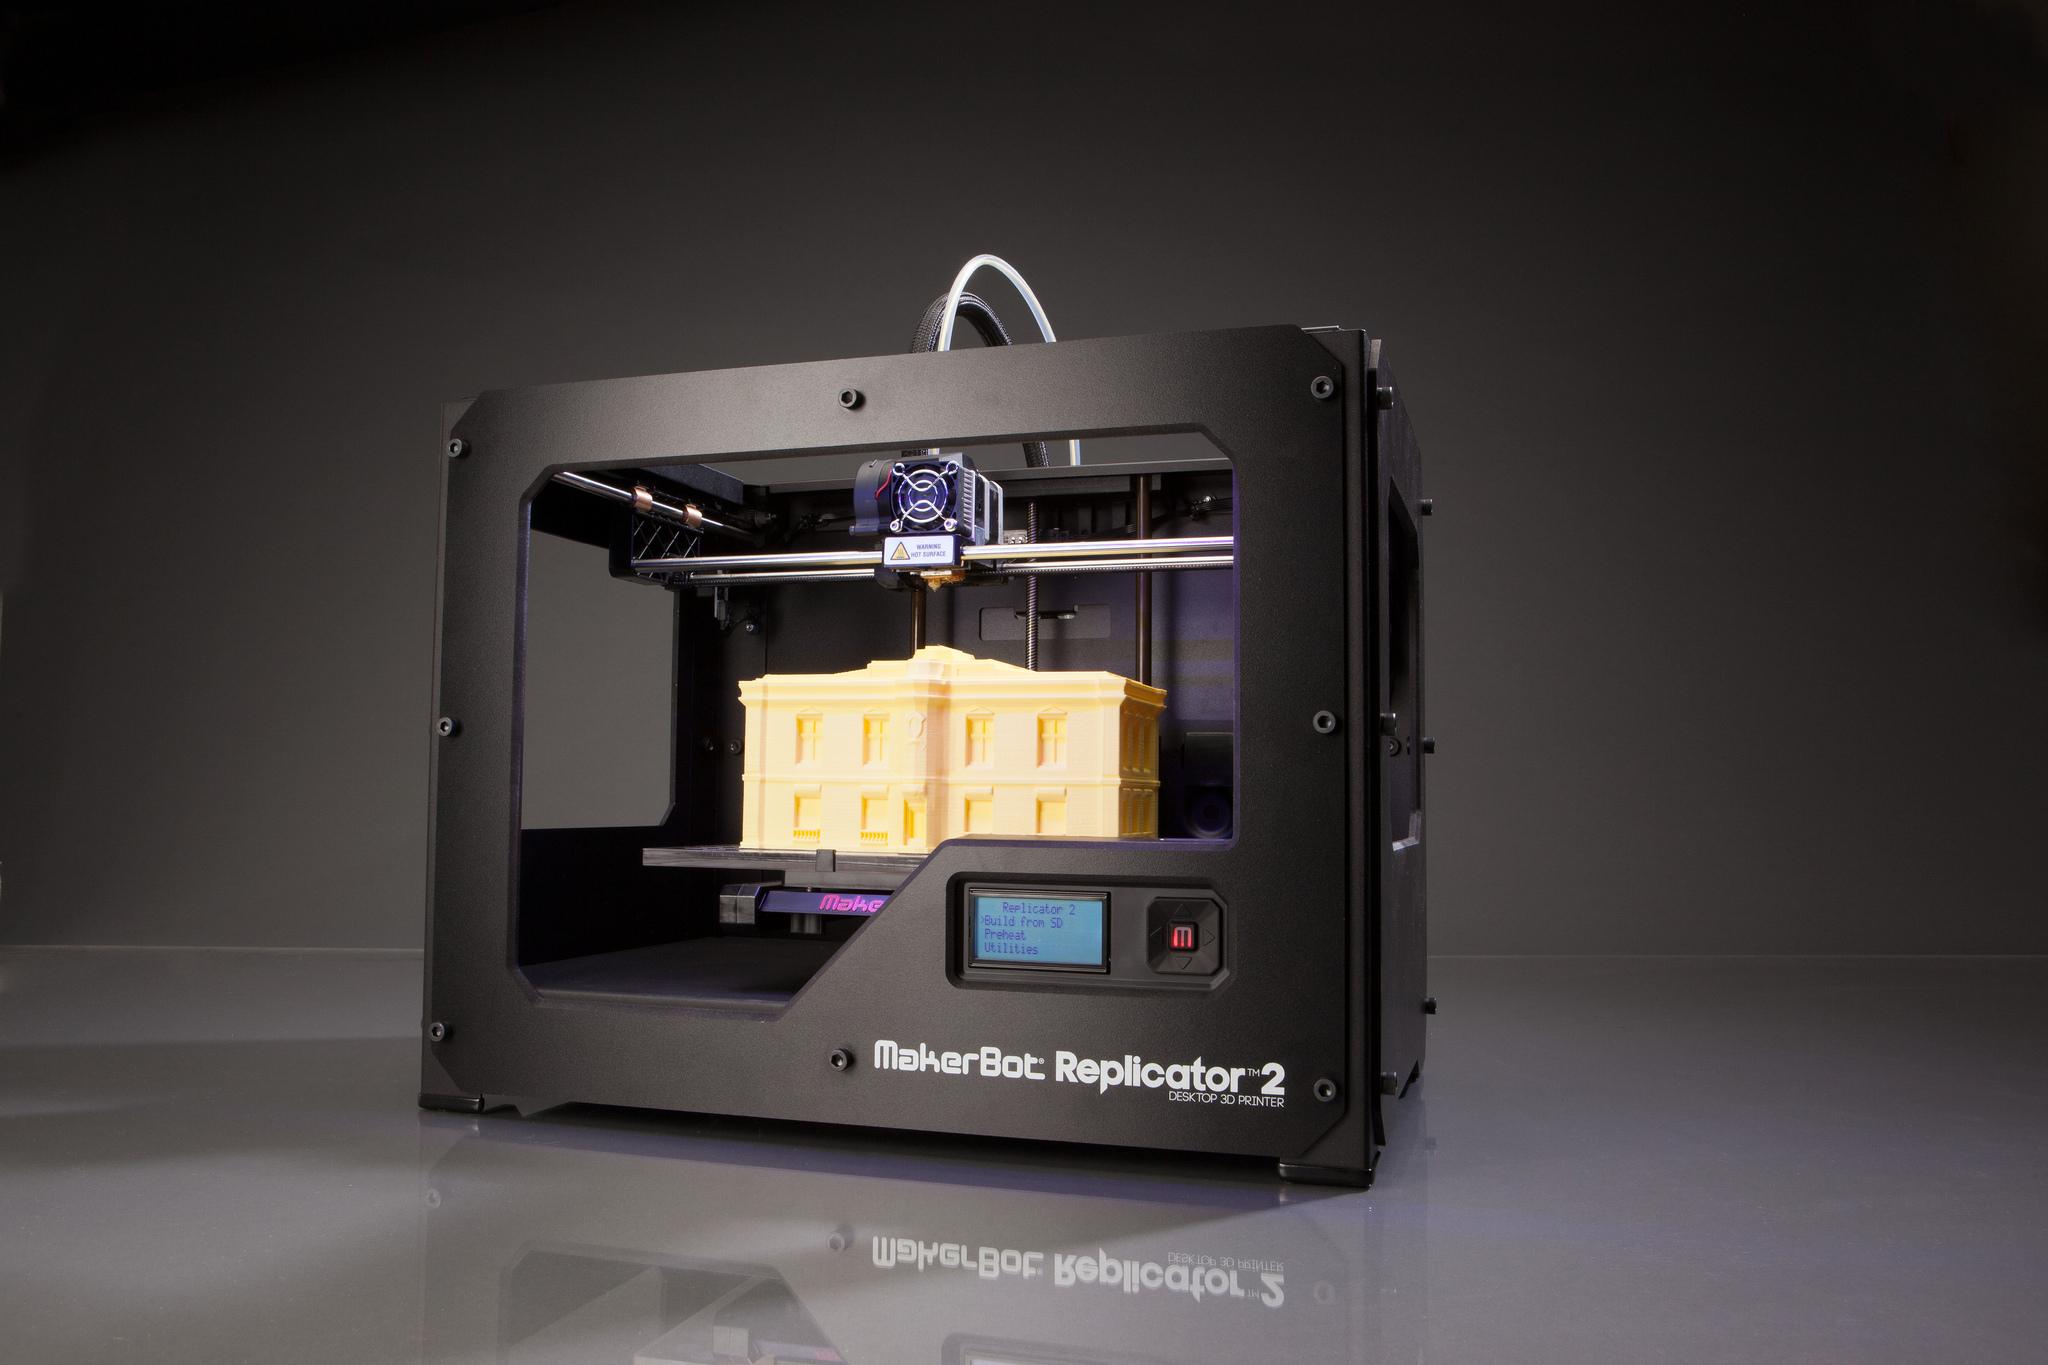 Makerbot Industries - Replicator 2 - 3D-printer 07, Creative Tools October 12, 2012